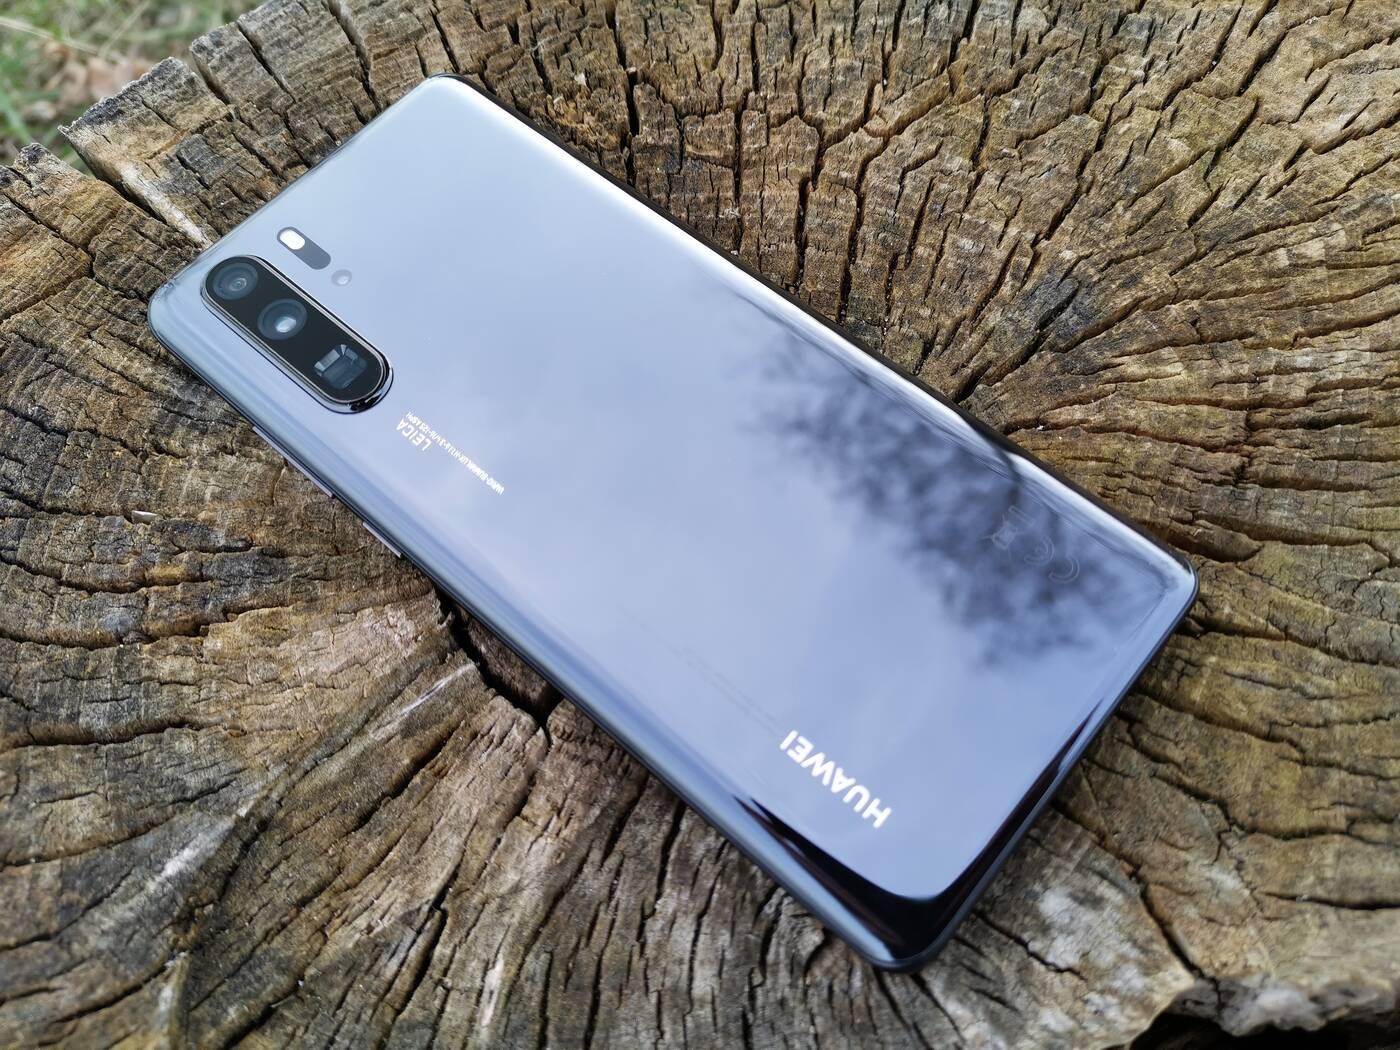 Huawei P30 Pro, P30 Pro, recenzja Huawei P30 Pro, recenzje Huawei P30 Pro, specyfikacja Huawei P30 Pro, wygląd Huawei P30 Pro, aparat Huawei P30 Pro, kamera Huawei P30 Pro, wrażenia Huawei P30 Pro, oceny Huawei P30 Pro, ocena Huawei P30 Pro, testy Huawei P30 Pro, opinia Huawei P30 Pro, opinie Huawei P30 Pro, test P30 Pro, testy P30 Pro, specyfikacja P30 Pro, wrażenia P30 Pro, wygląd P30 Pro, ekran P30 Pro, aparat P30 Pro, recenzja P30 Pro, recenzje P30 Pro, opinie P30 Pro, opinia P30 Pro, oceny P30 Pro, ocena P30 Pro, Huawei, Huawei P30, zdjęcia P30 Pro, zdjęcia huawei p30 pro,